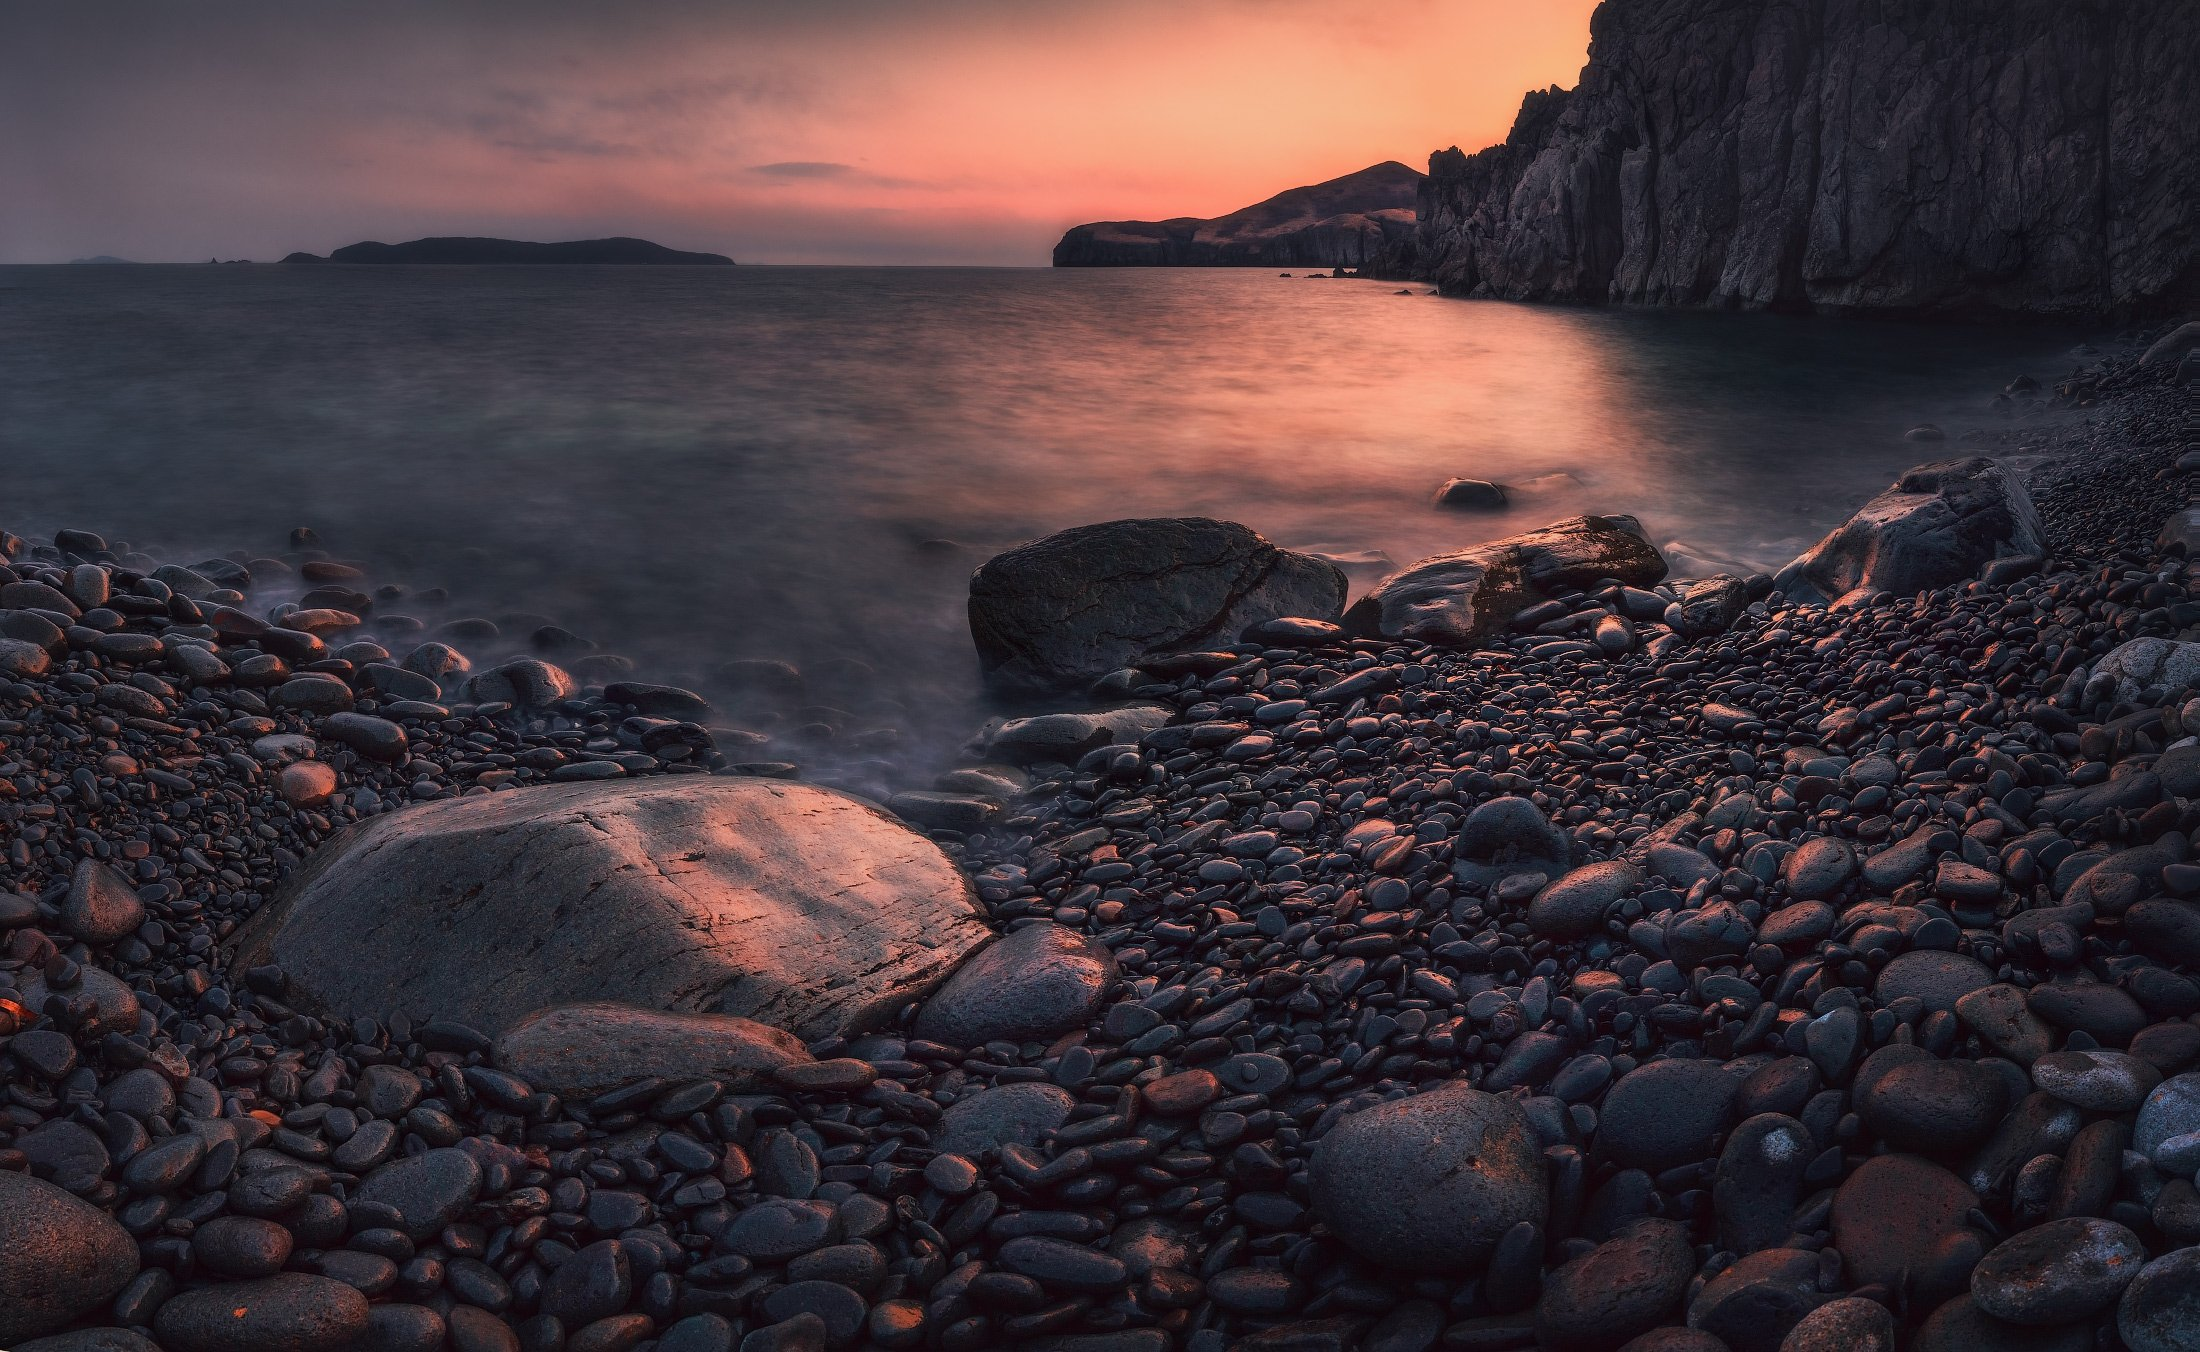 Вечер, Закат, Камни, Море, Небо, Скалы, Андрей Кровлин